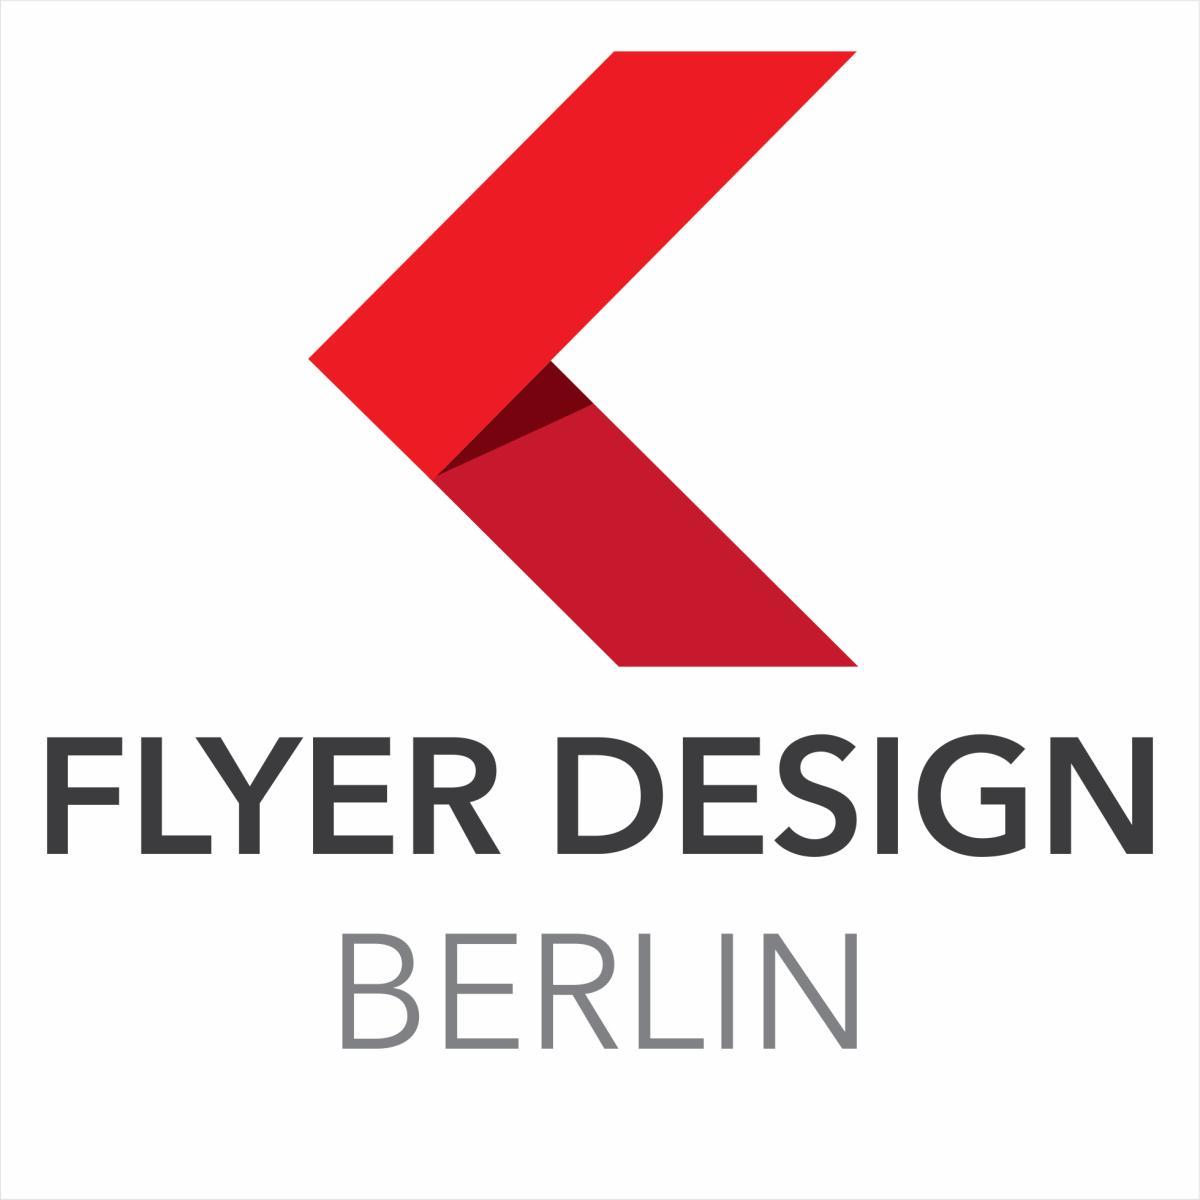 flyer entwerfen grafikdesign flyer design berlin werbeberater marketingberater steglitz. Black Bedroom Furniture Sets. Home Design Ideas